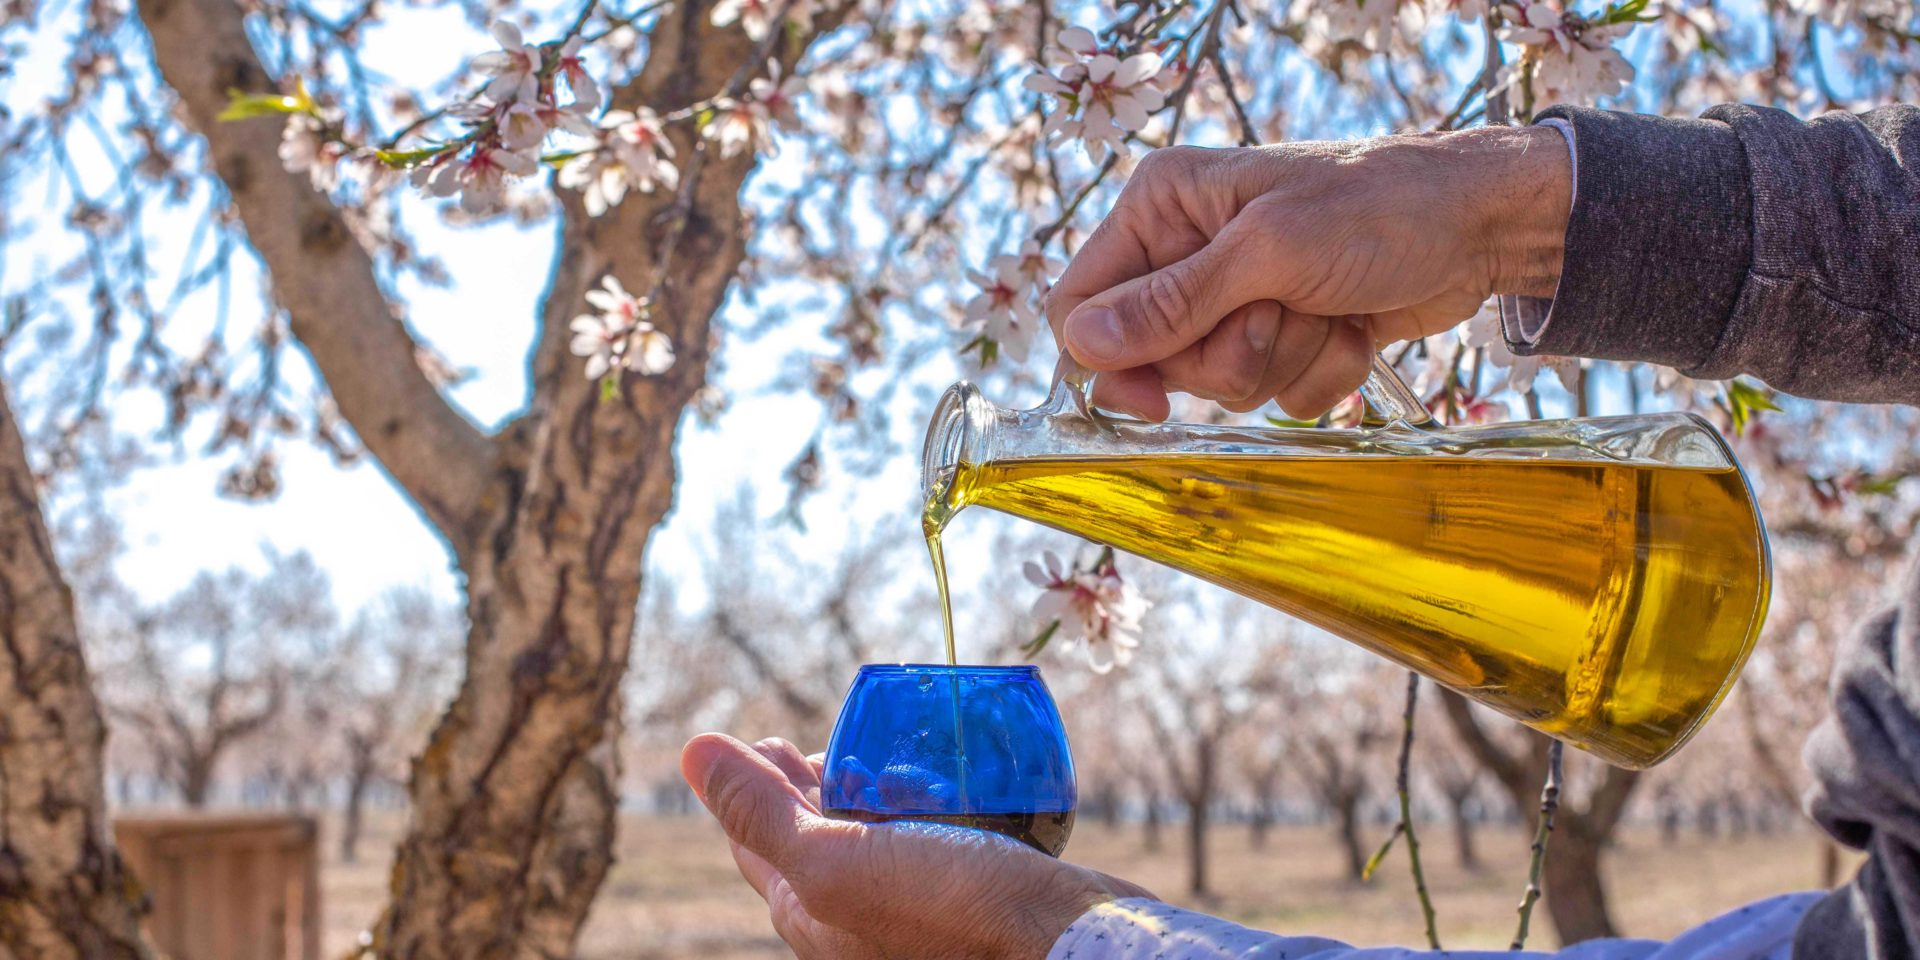 oliva arbequina experiencies garrigues